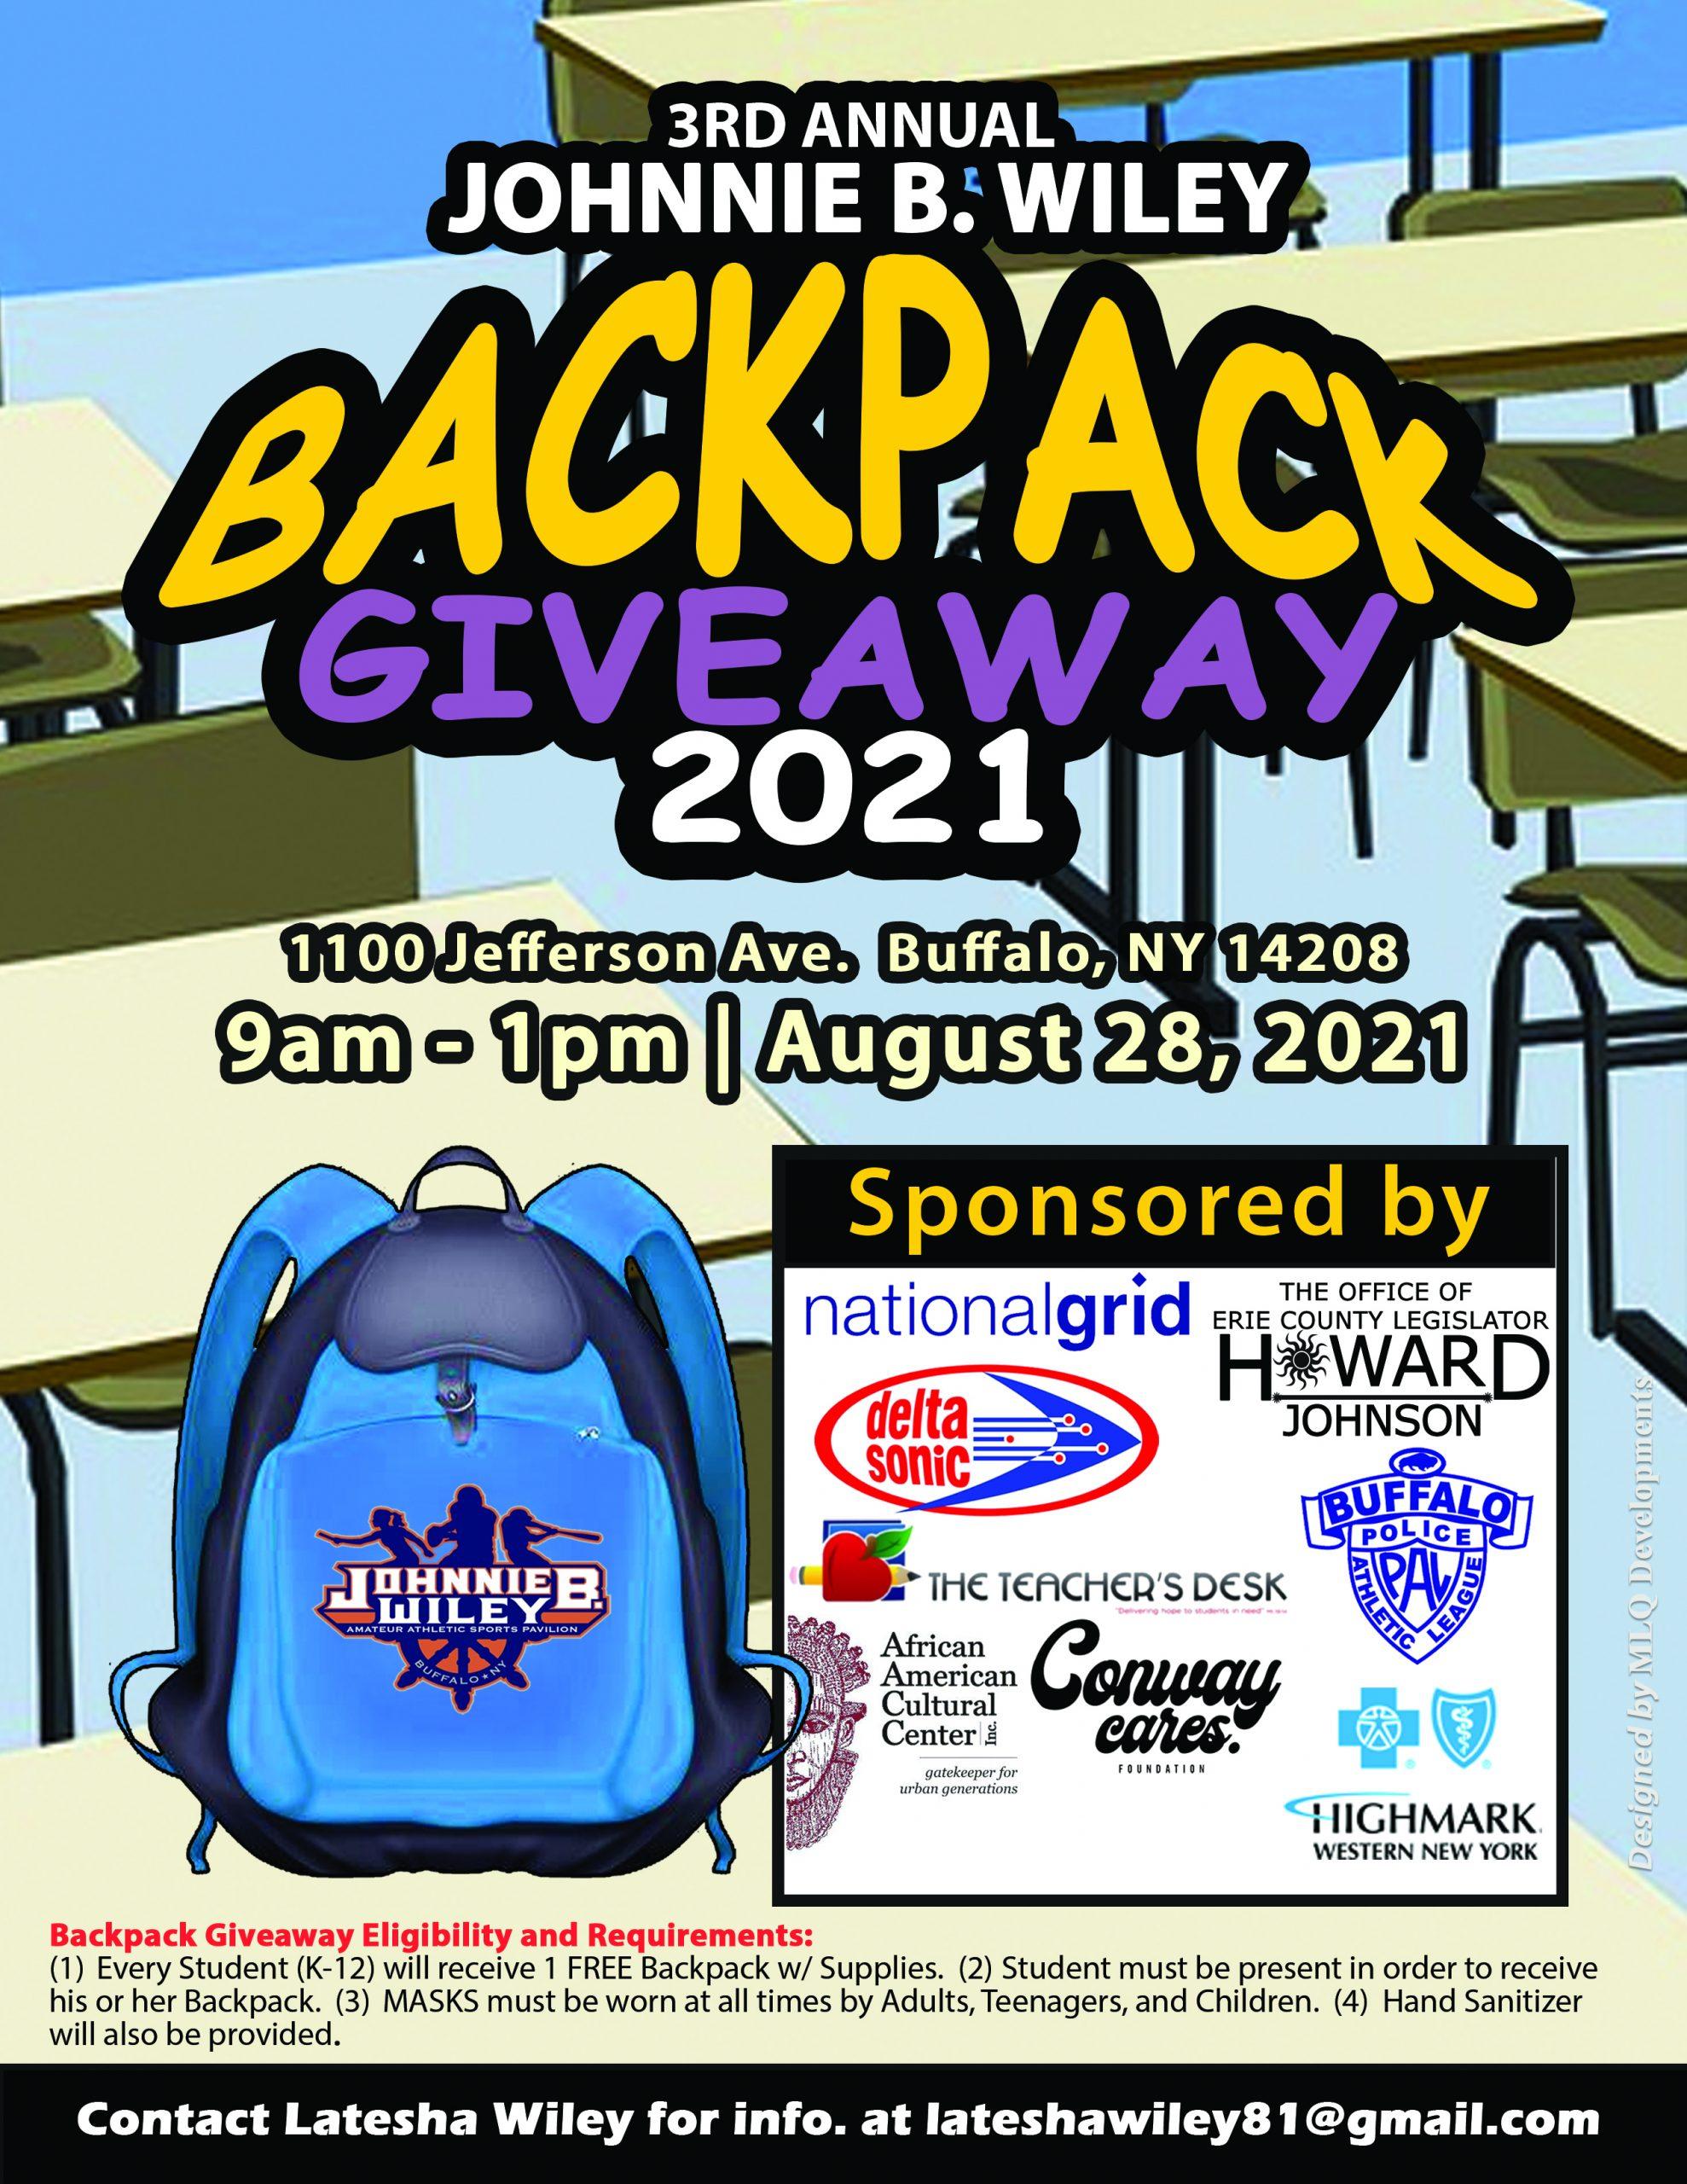 Backpack Giveaway Promotional Flyer